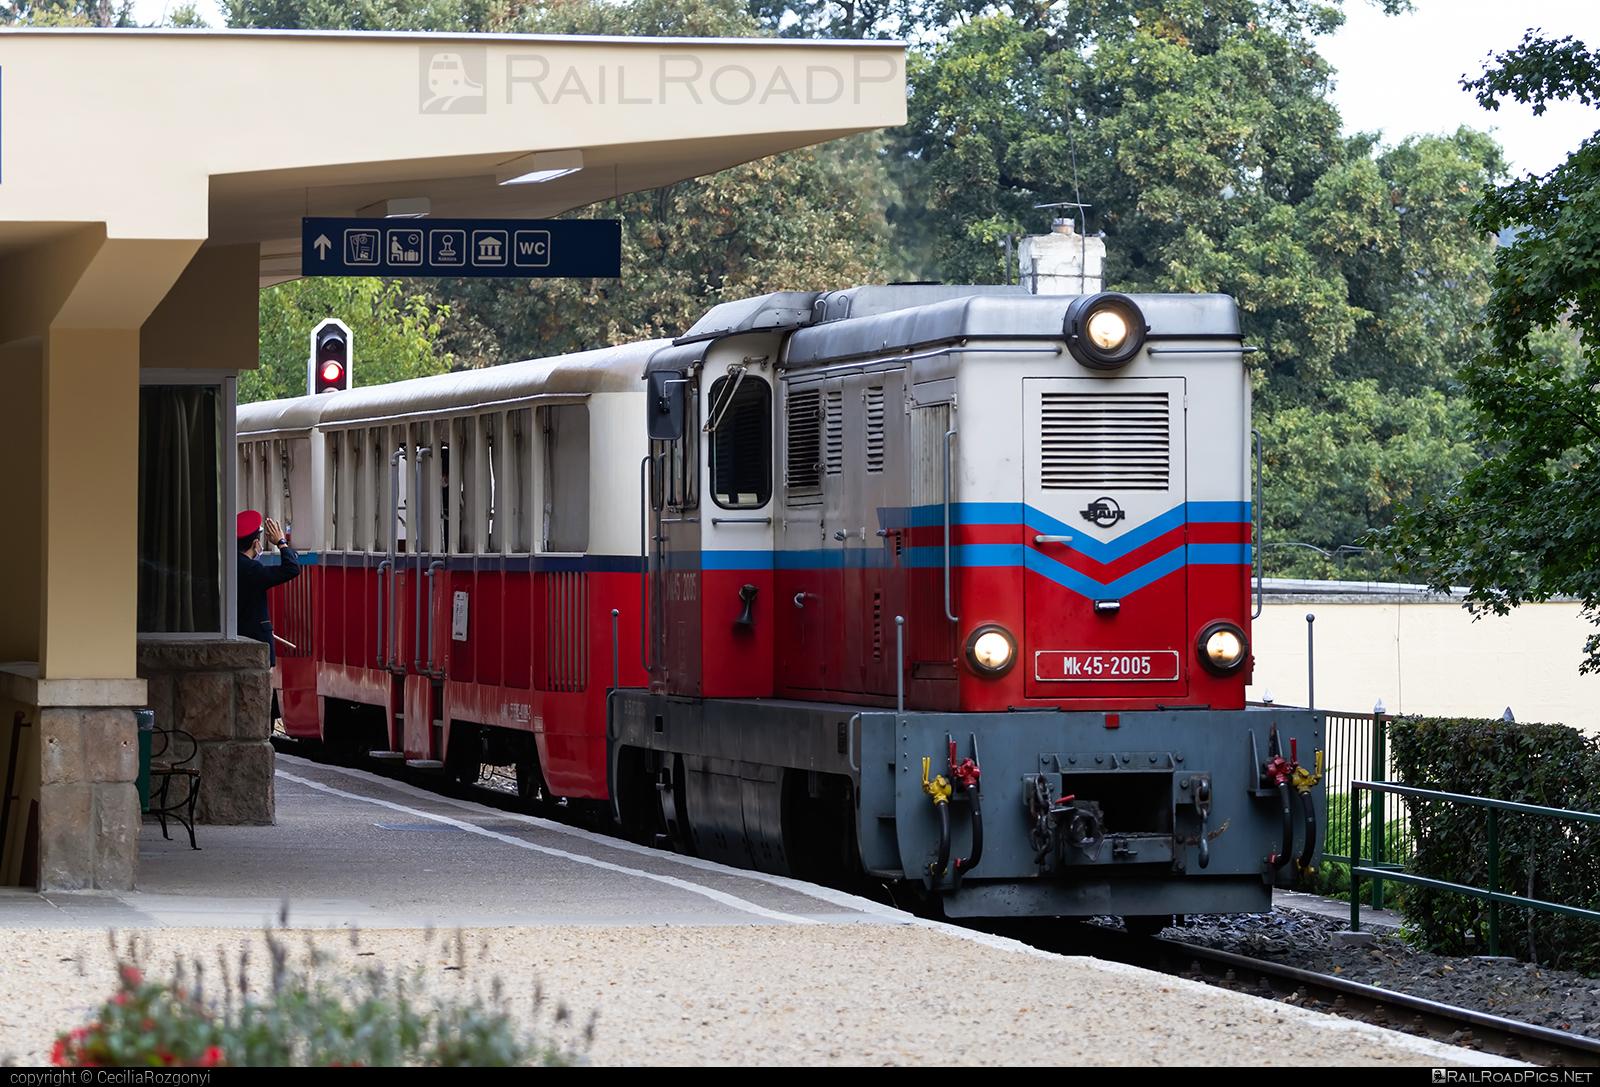 23 August Works (FAUR) L45H - Mk45-2005 operated by Magyar Államvasutak ZRt. #23augustworks #faur #faurl45h #l45h #magyarallamvasutak #magyarallamvasutakzrt #mav #uzinele23august